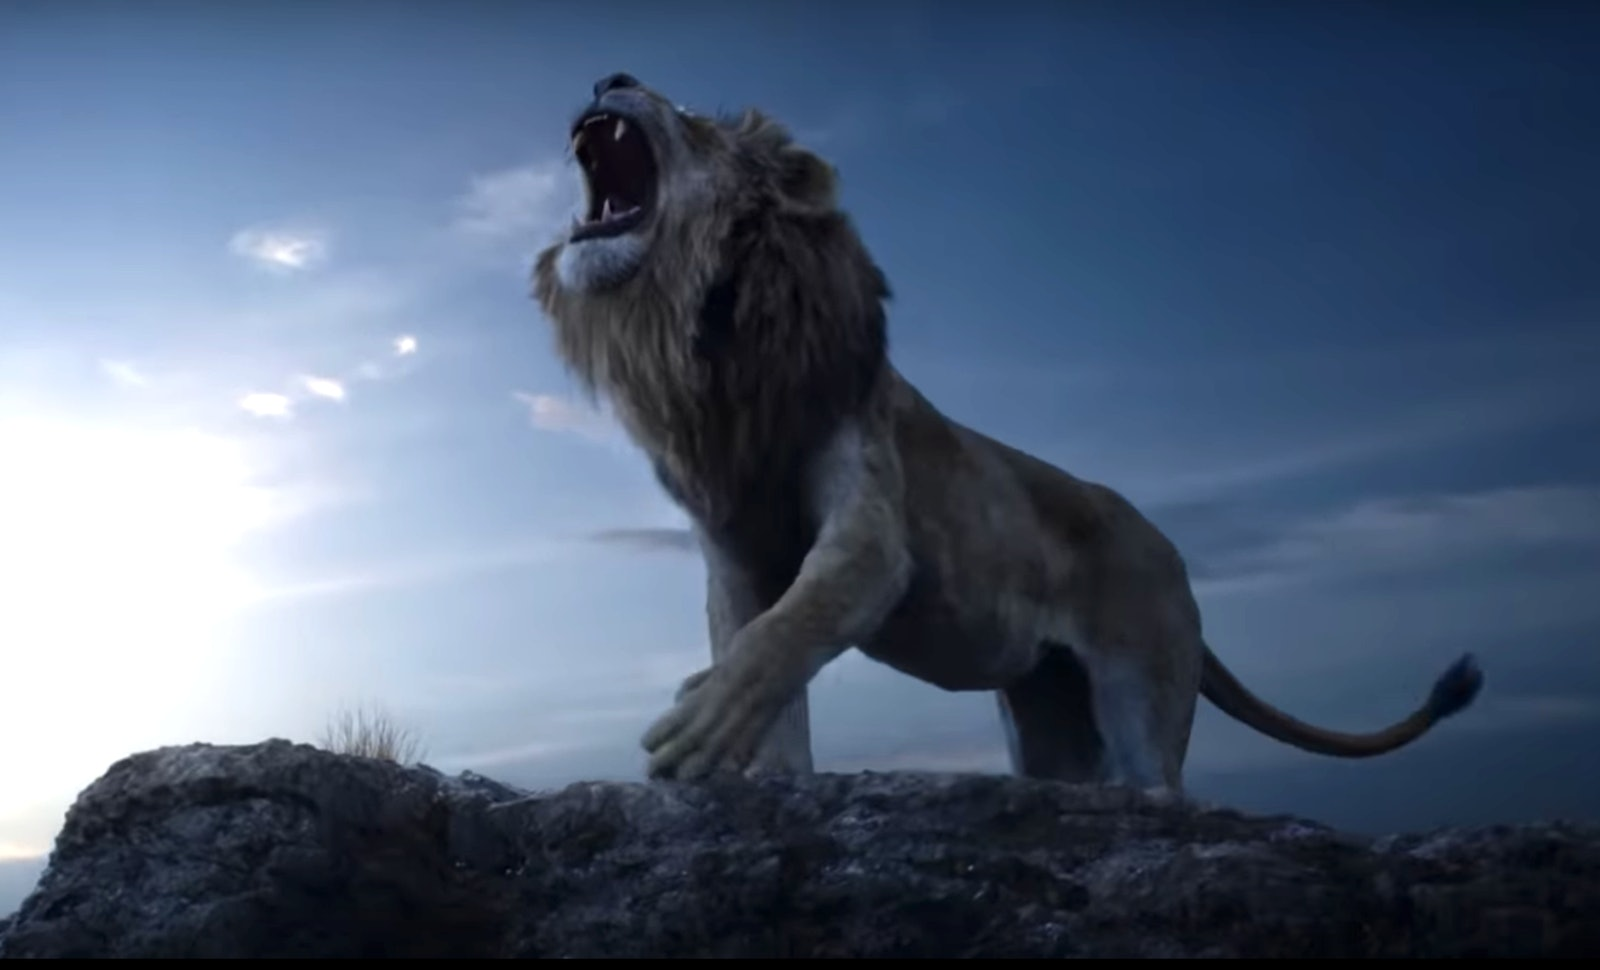 the new  u0026 39 lion king u0026 39  trailer was viewed 224 million times